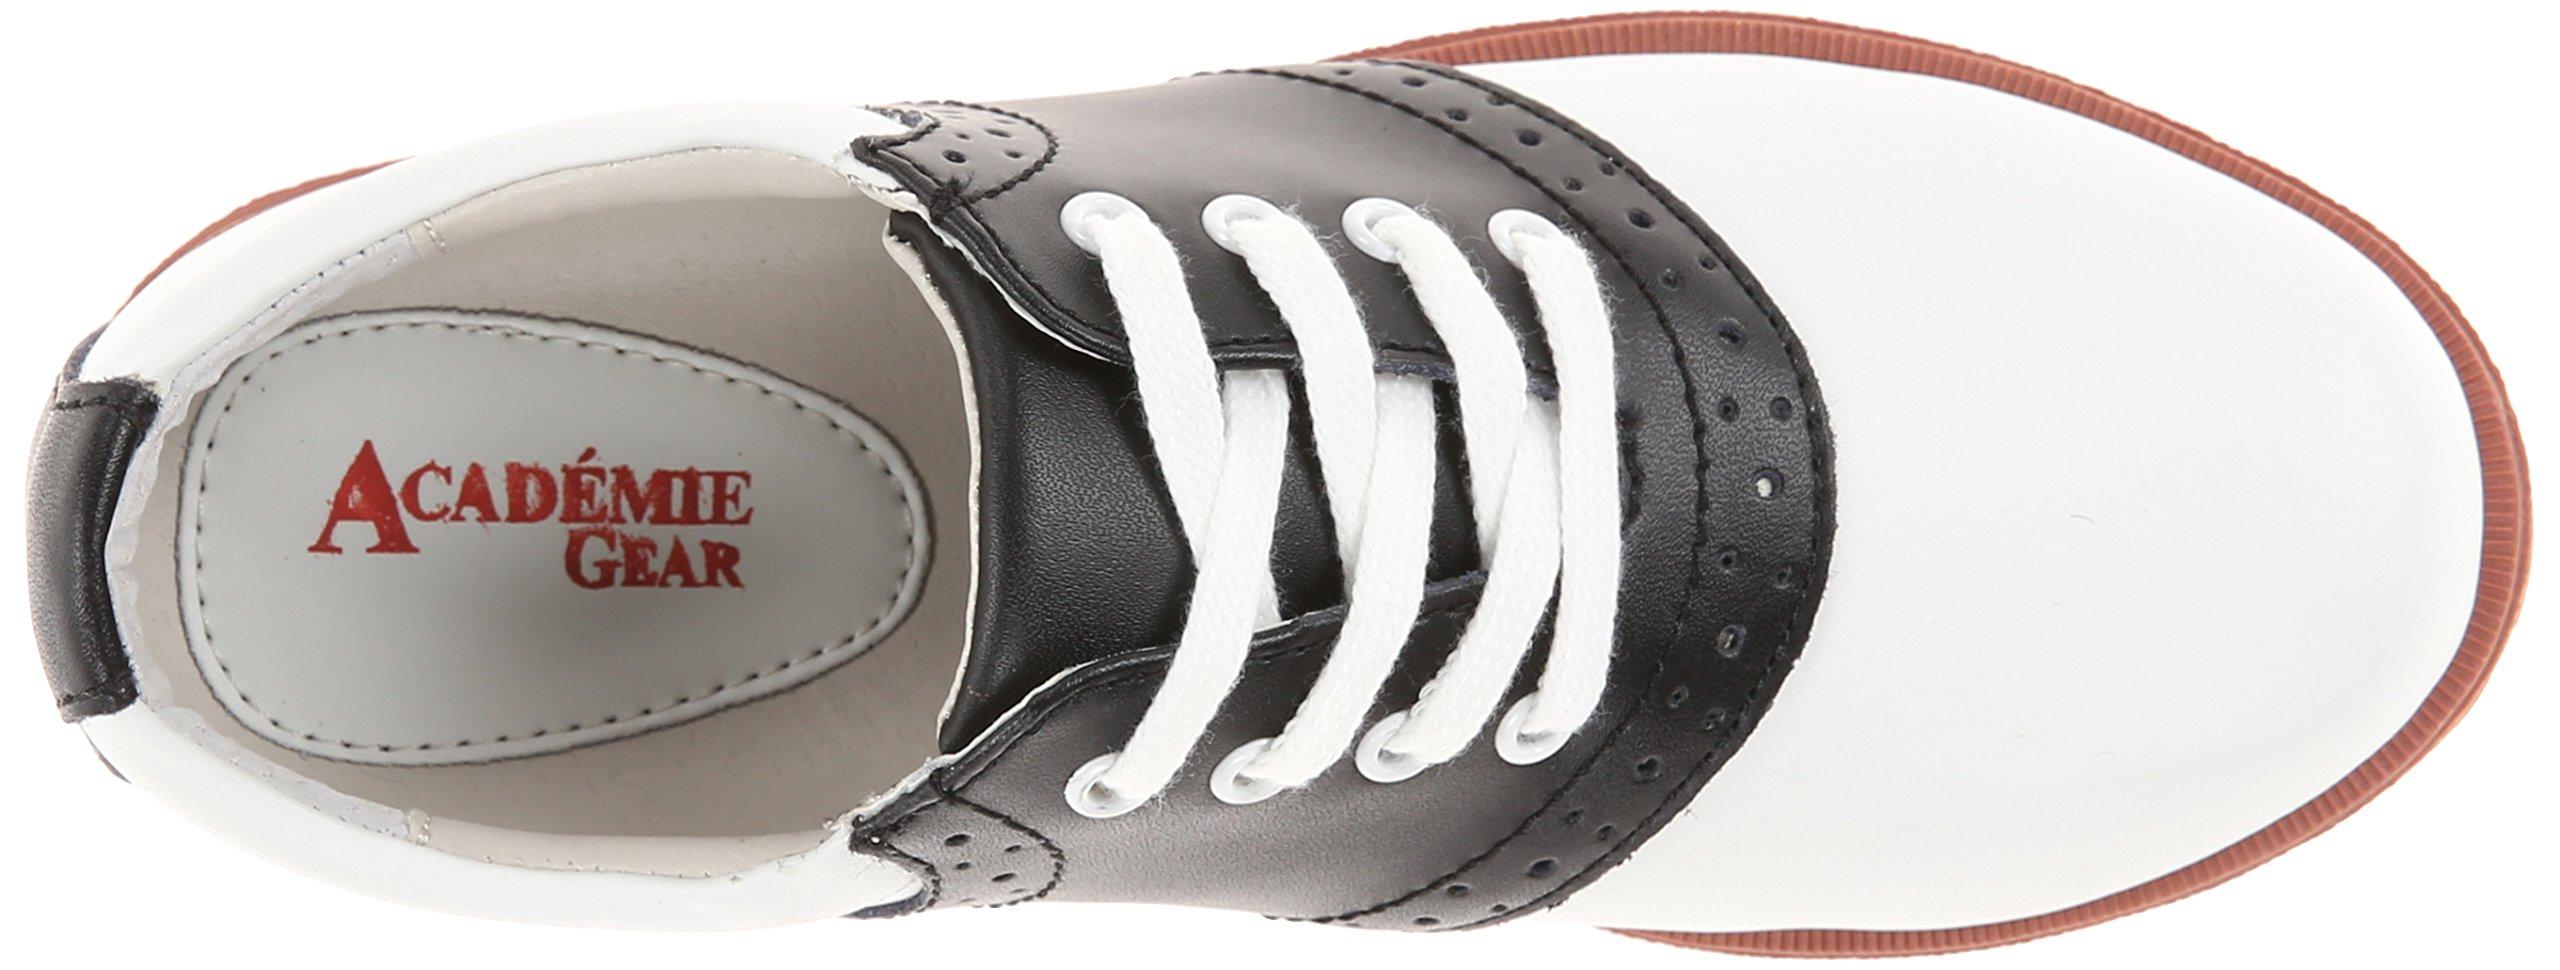 Academie Gear Honor Roll Saddle Shoe (Toddler/Little Kid/Big Kid),White/Black,4 W US Big Kid by Academie Gear (Image #8)